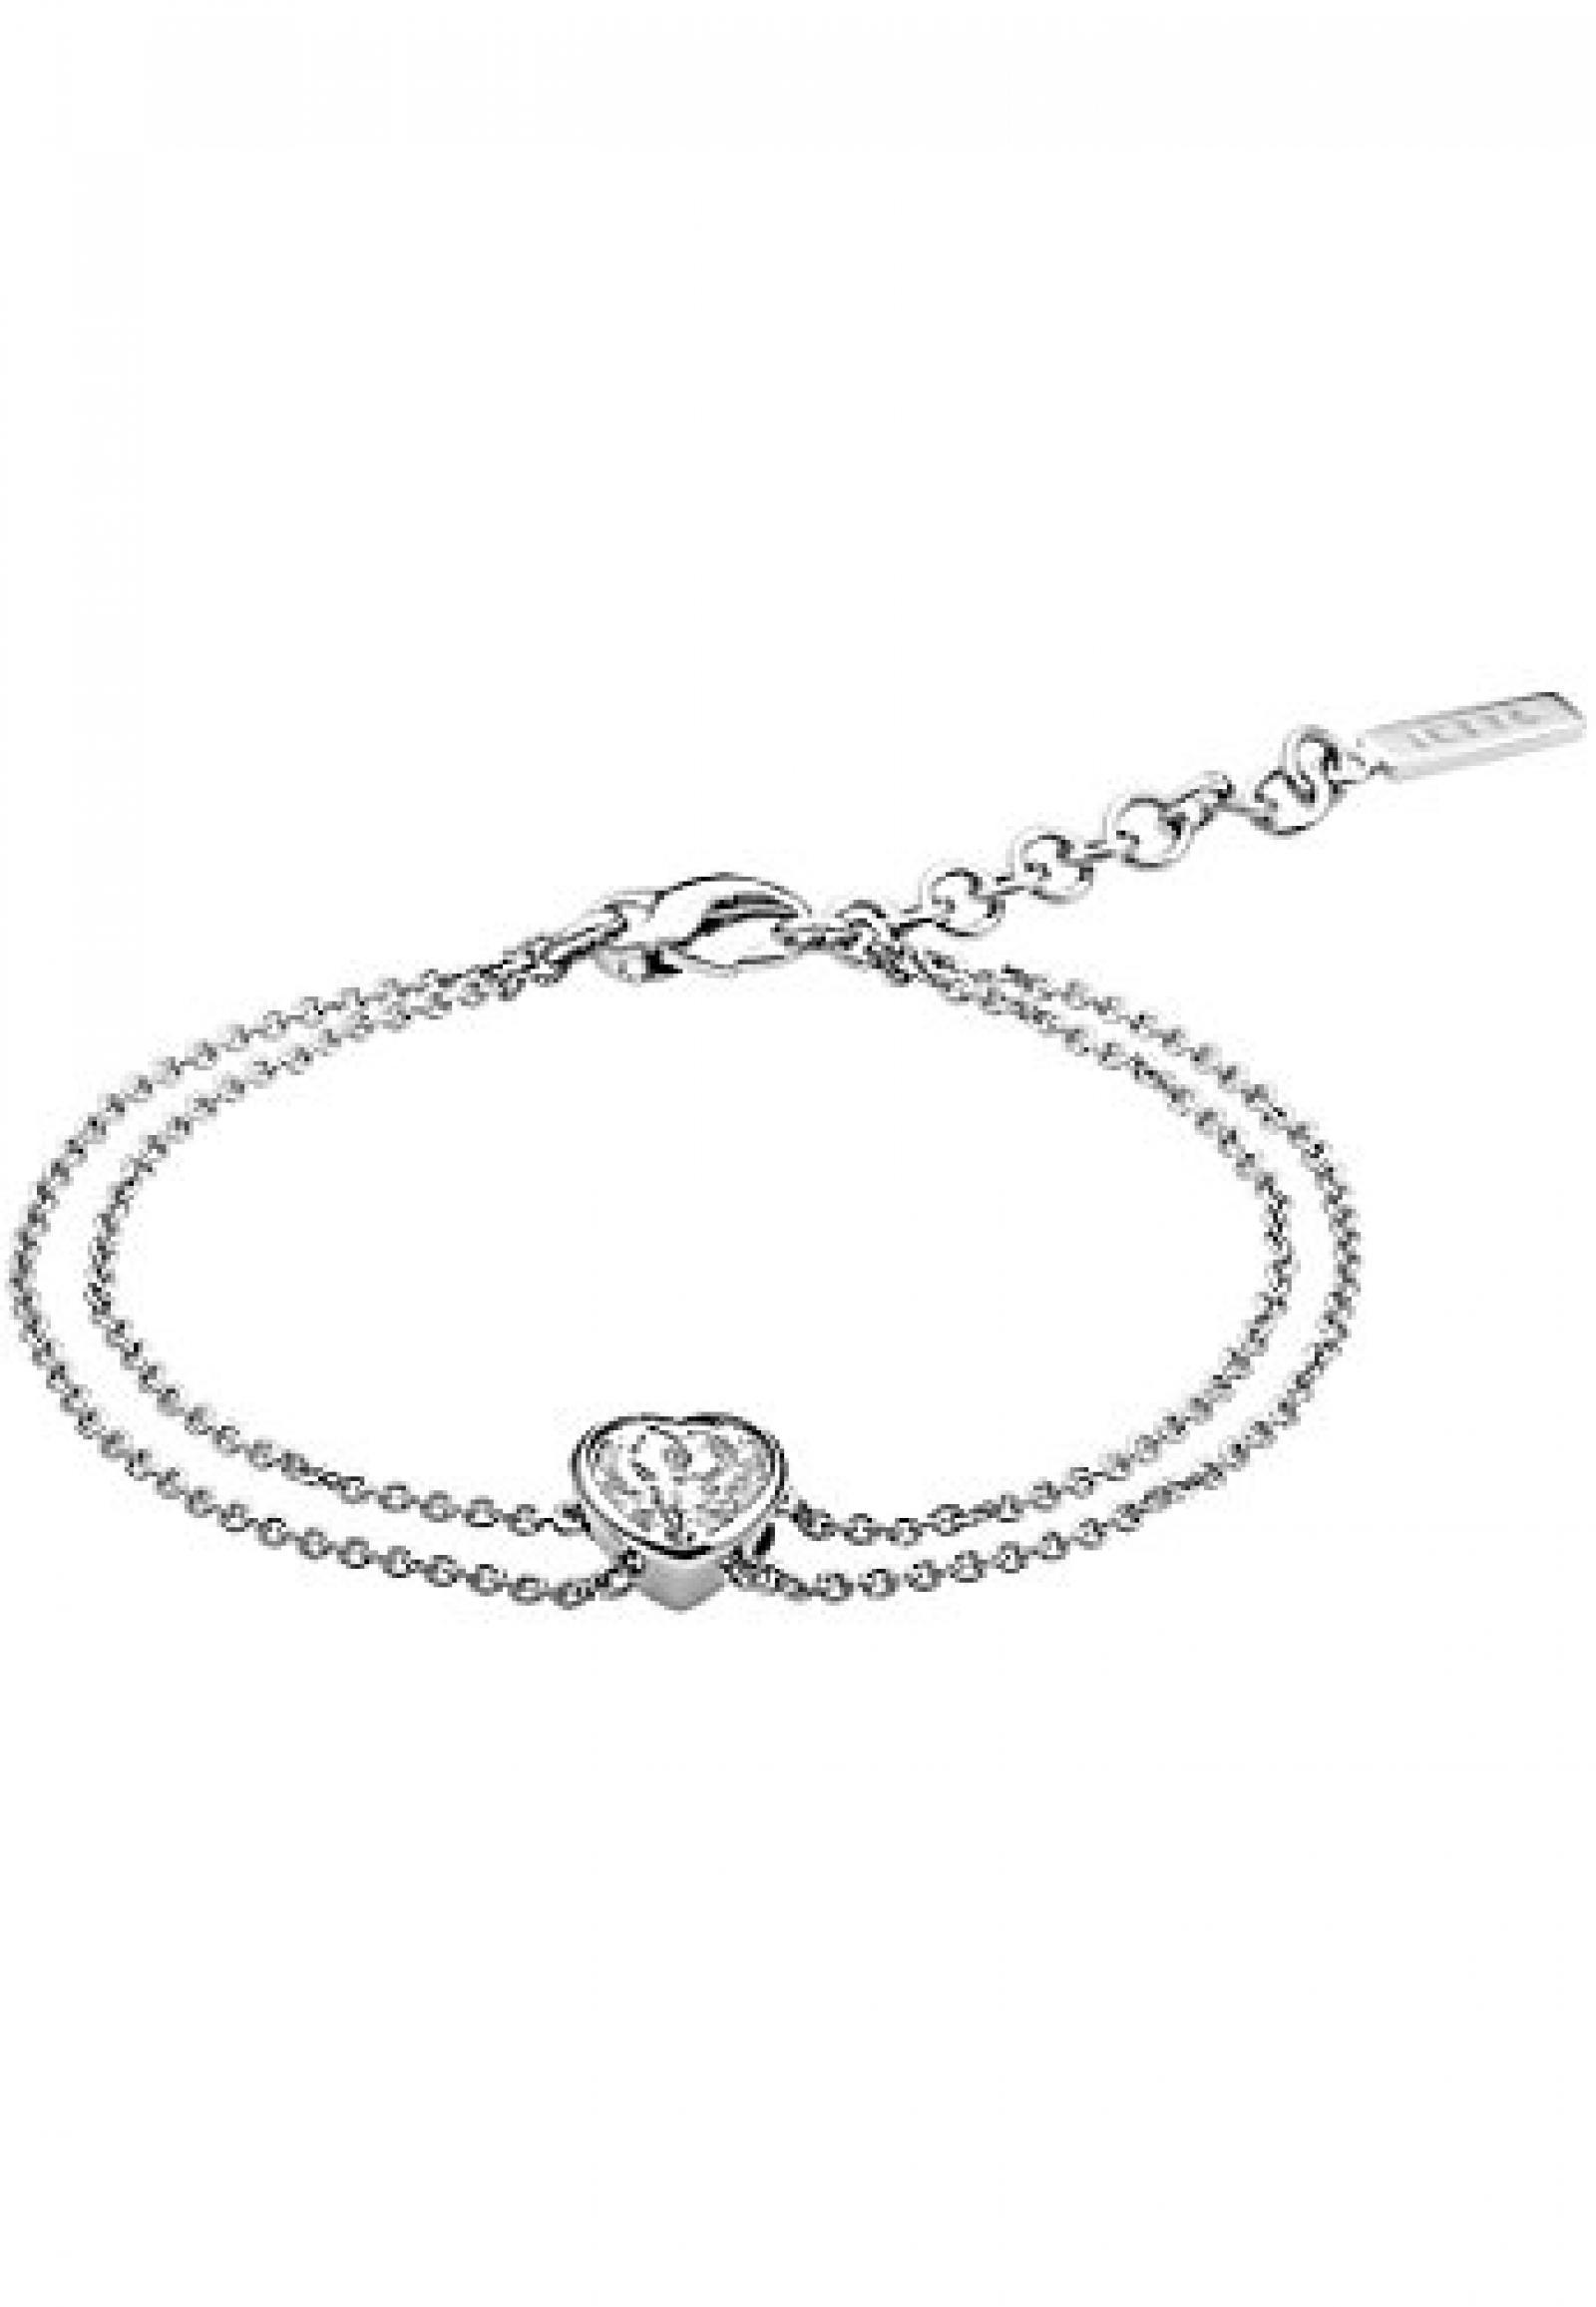 JETTE Silver Damen-Armband Heart 925er Silber rhodiniert 1 Zirkonia silber, One Size